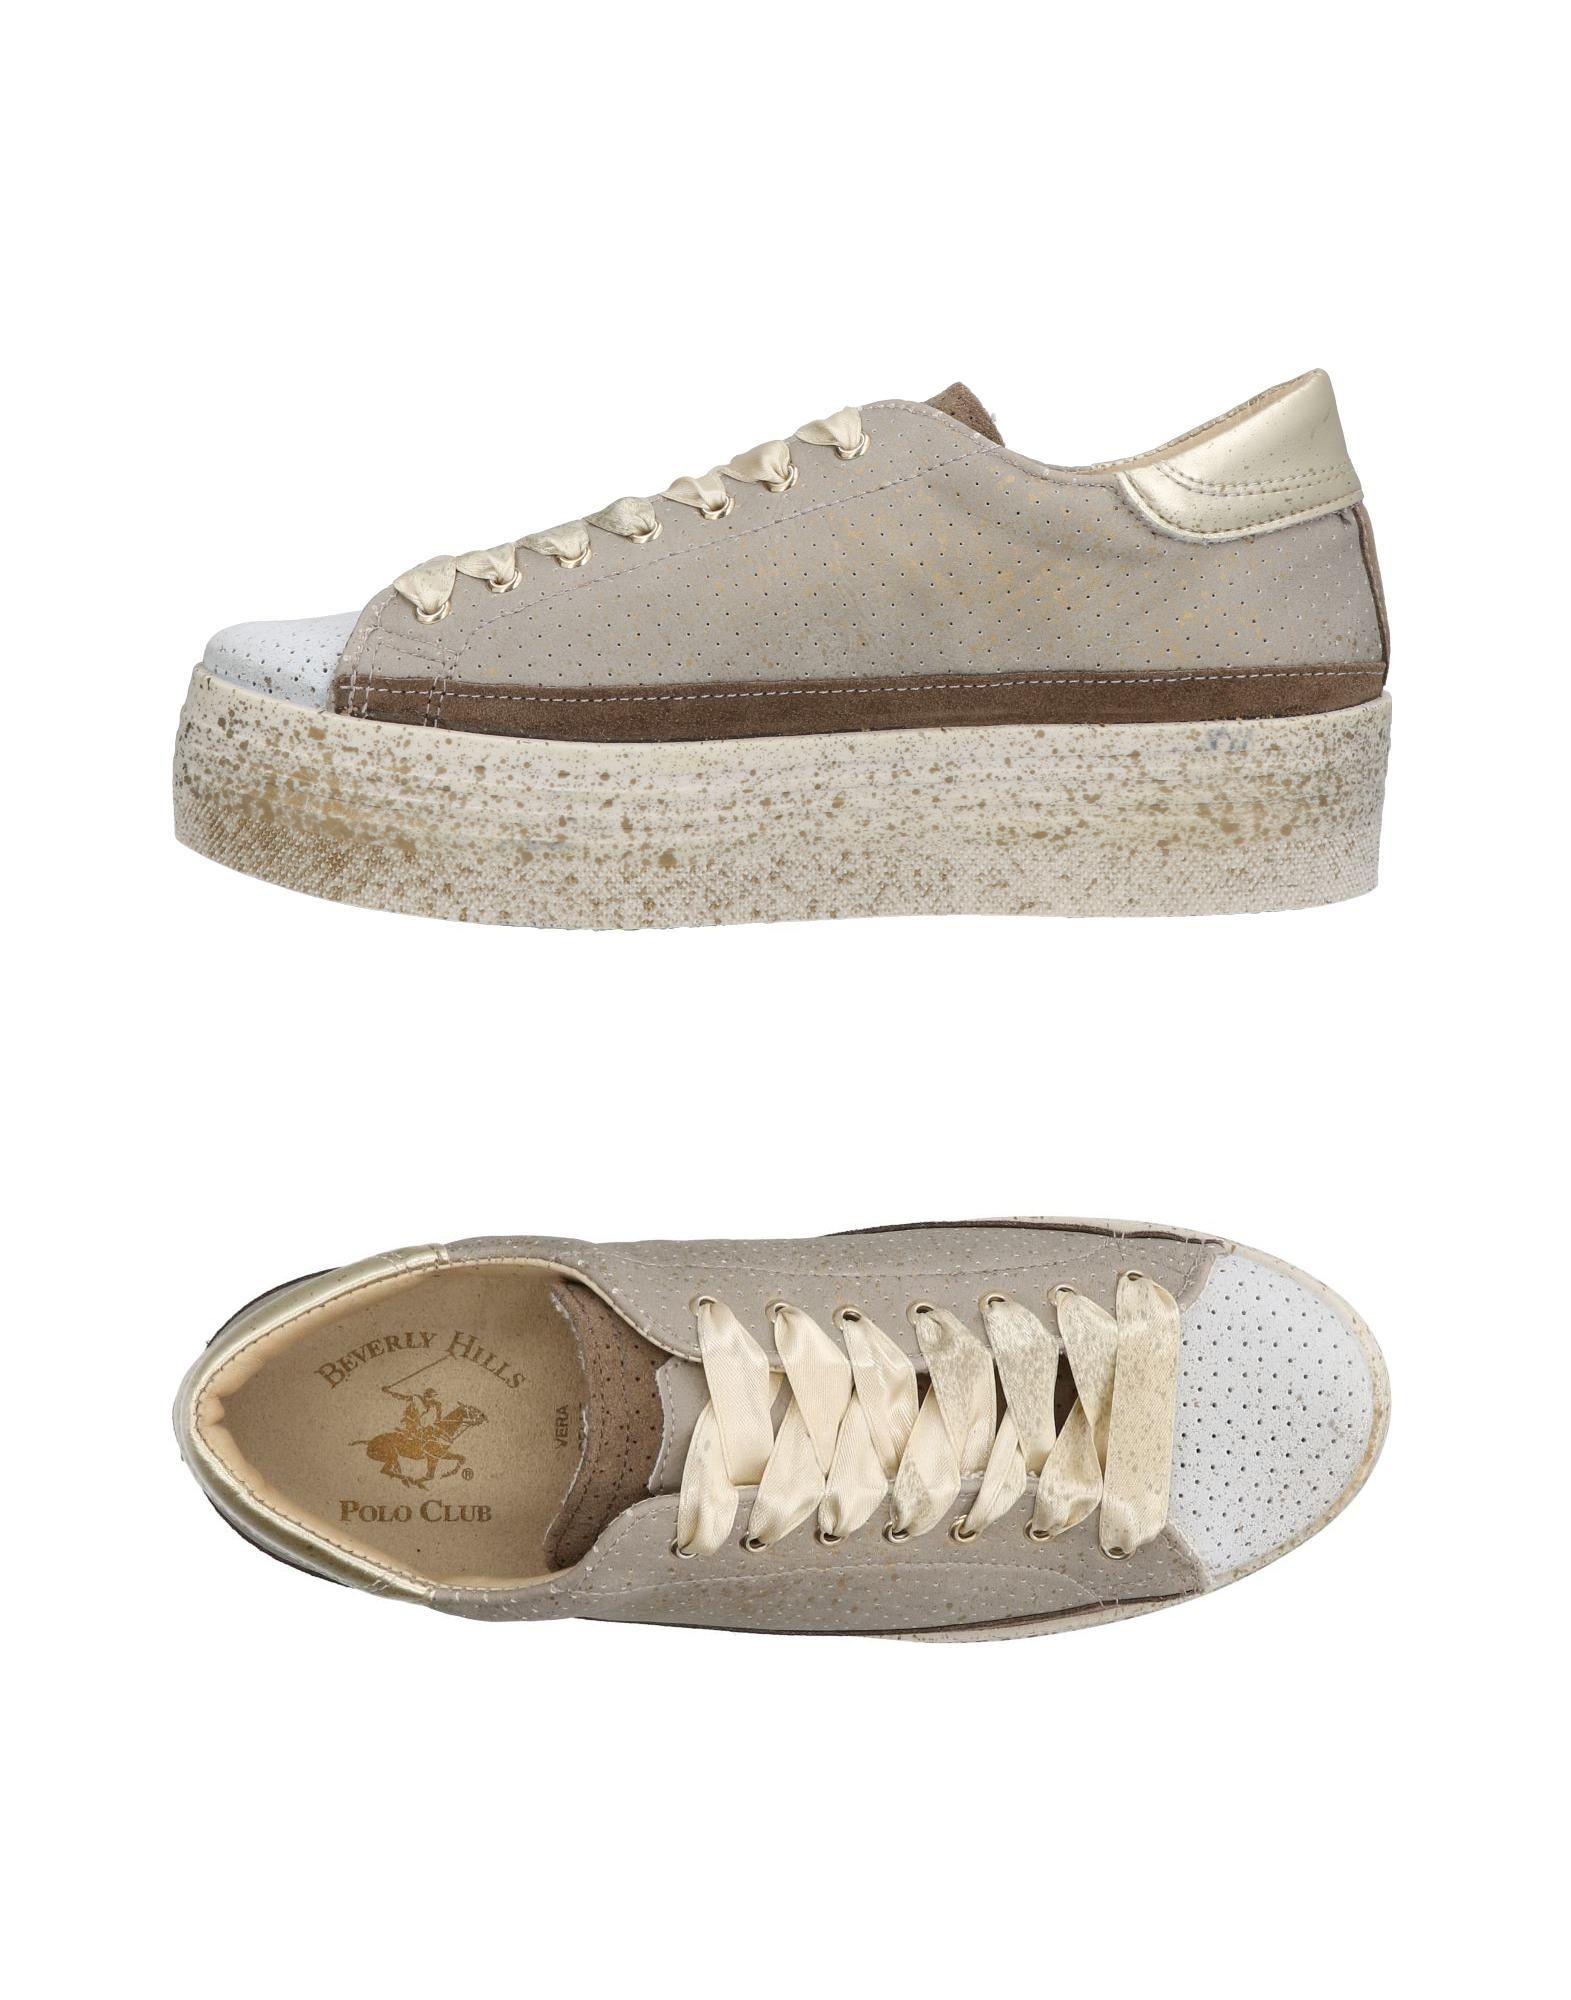 Beverly Hills Polo Club Sneakers Damen  11483975JC Gute Qualität beliebte Schuhe